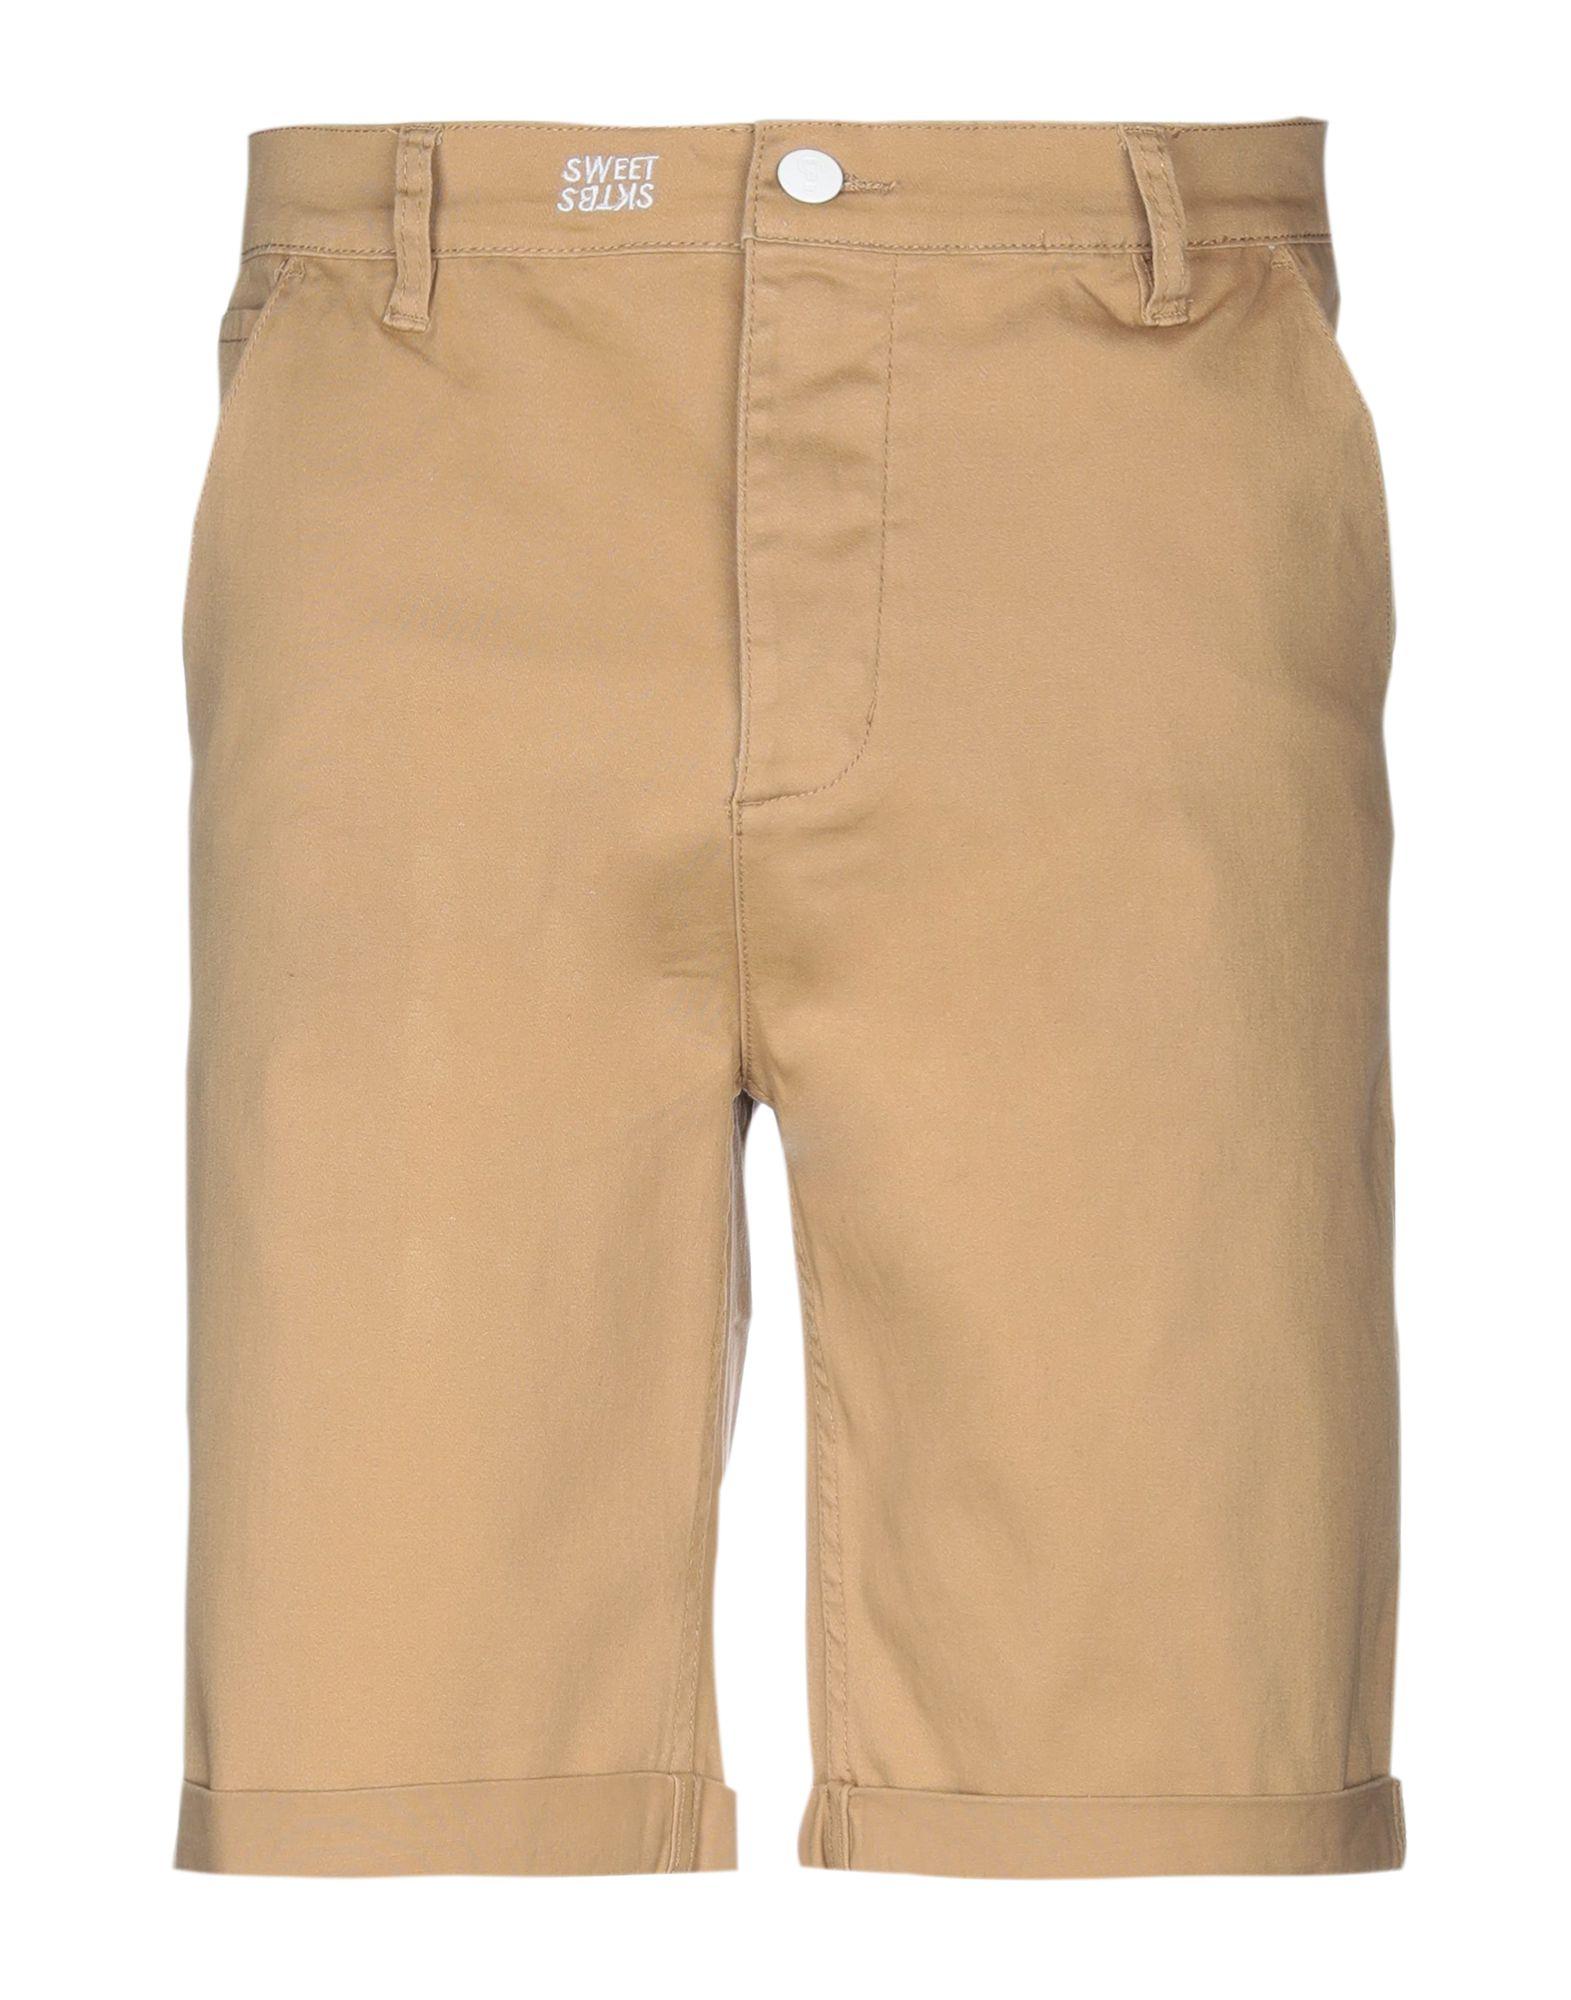 SWEET SKTBS Шорты и бермуды sweet sktbs джинсовые шорты